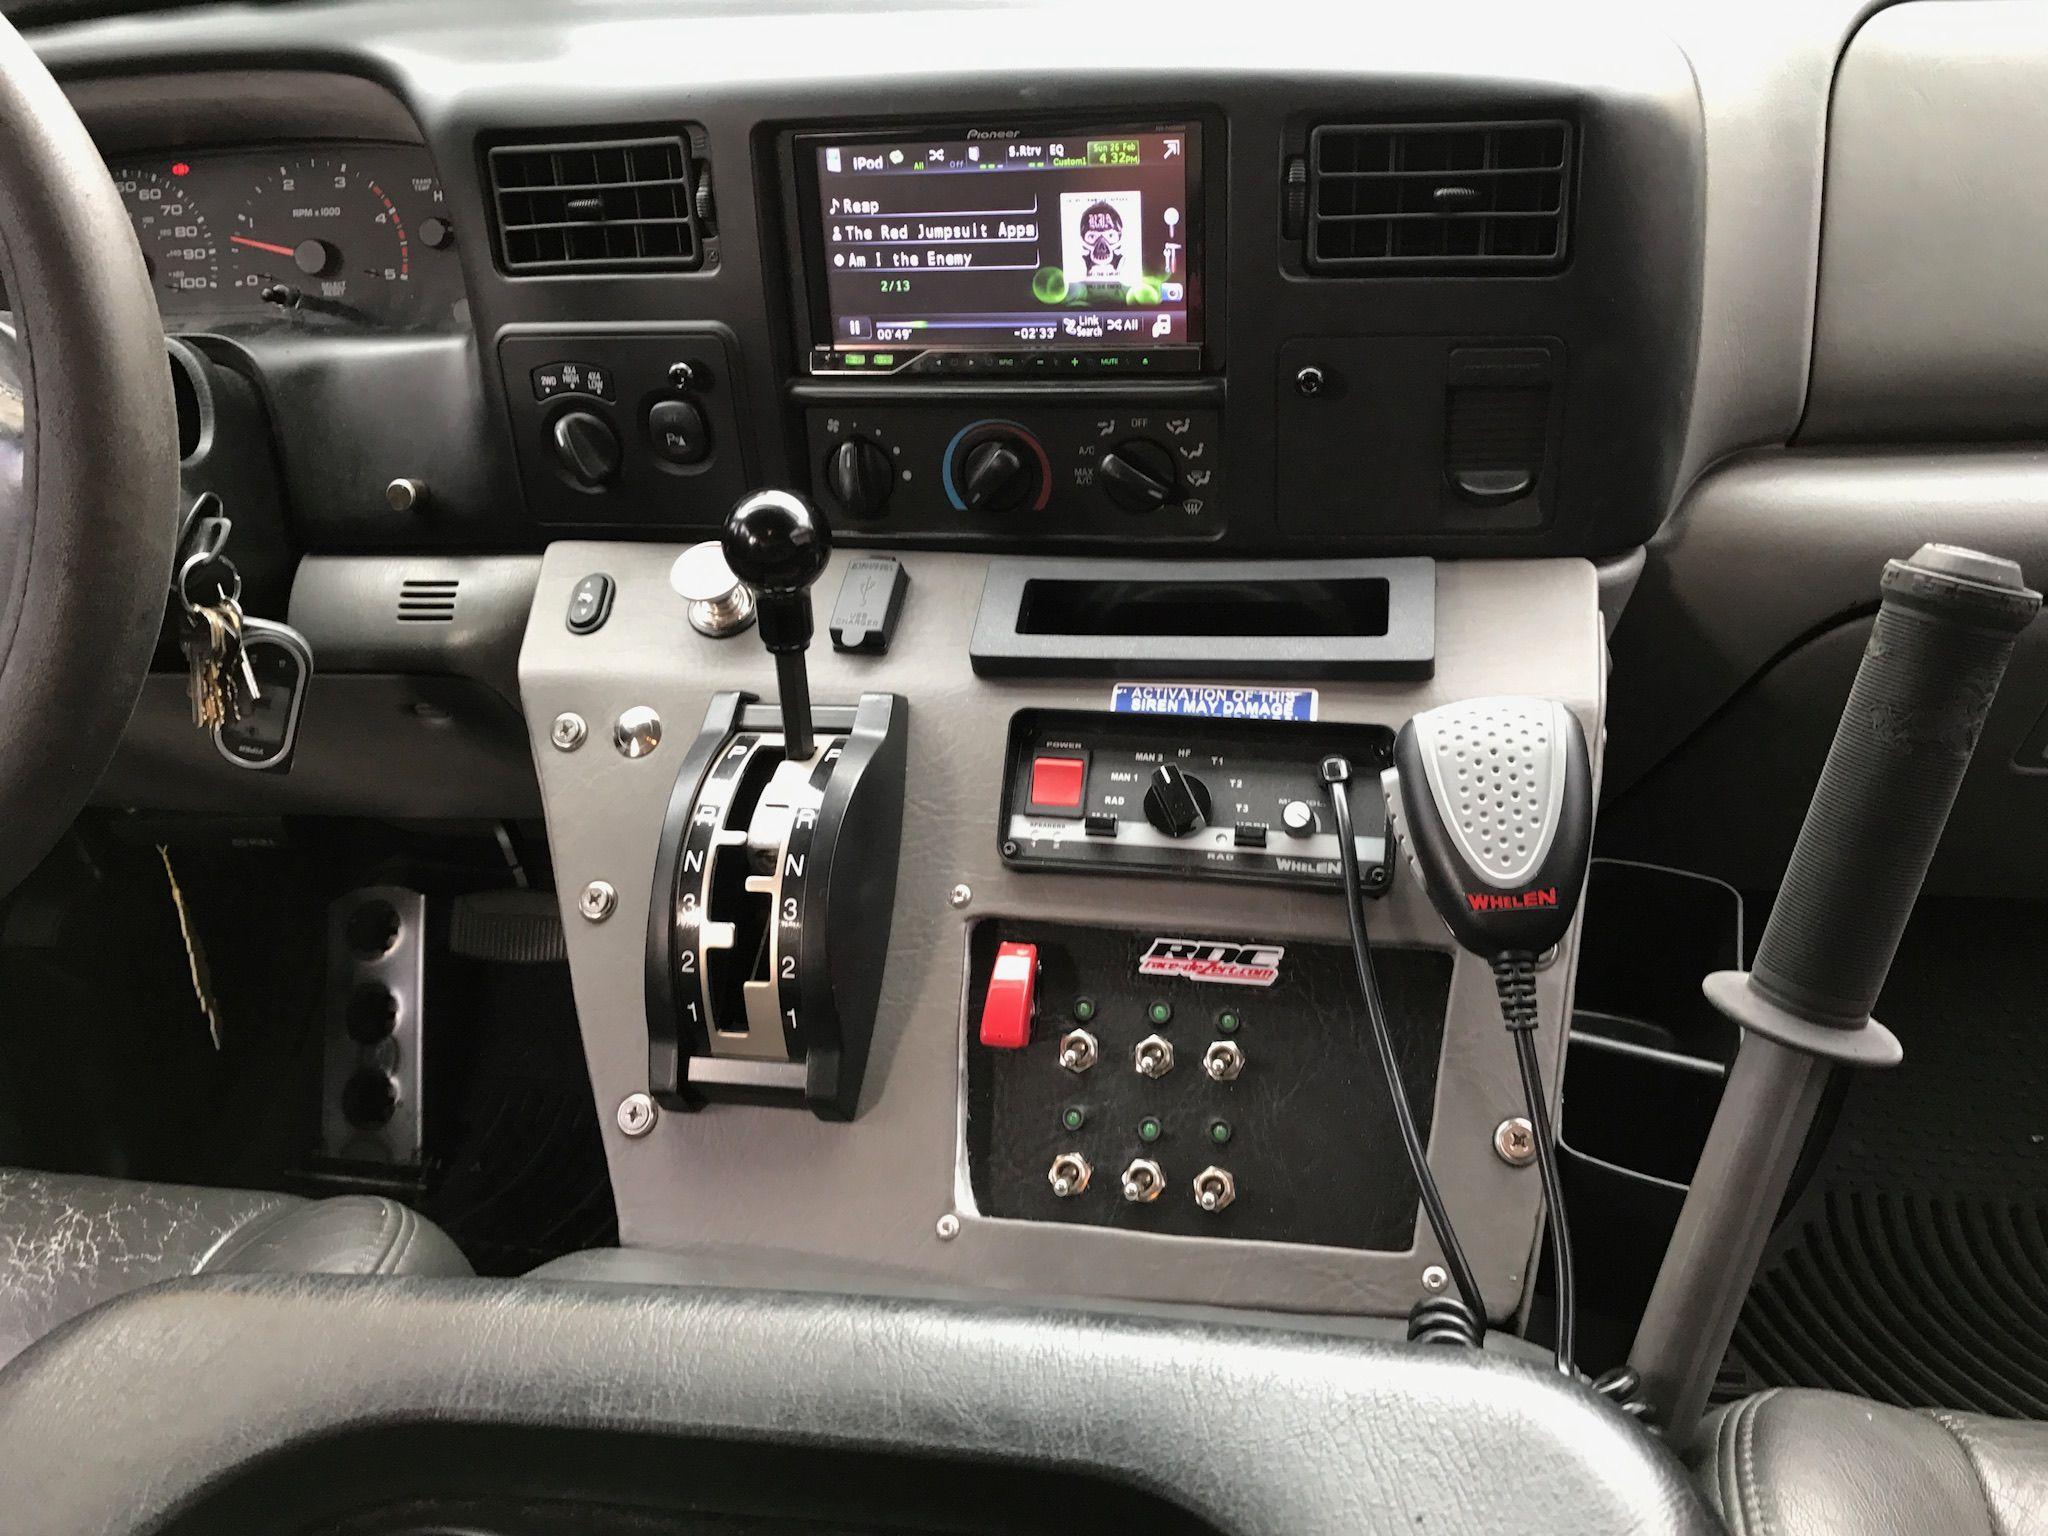 F250 super duty custom center console. Custom center